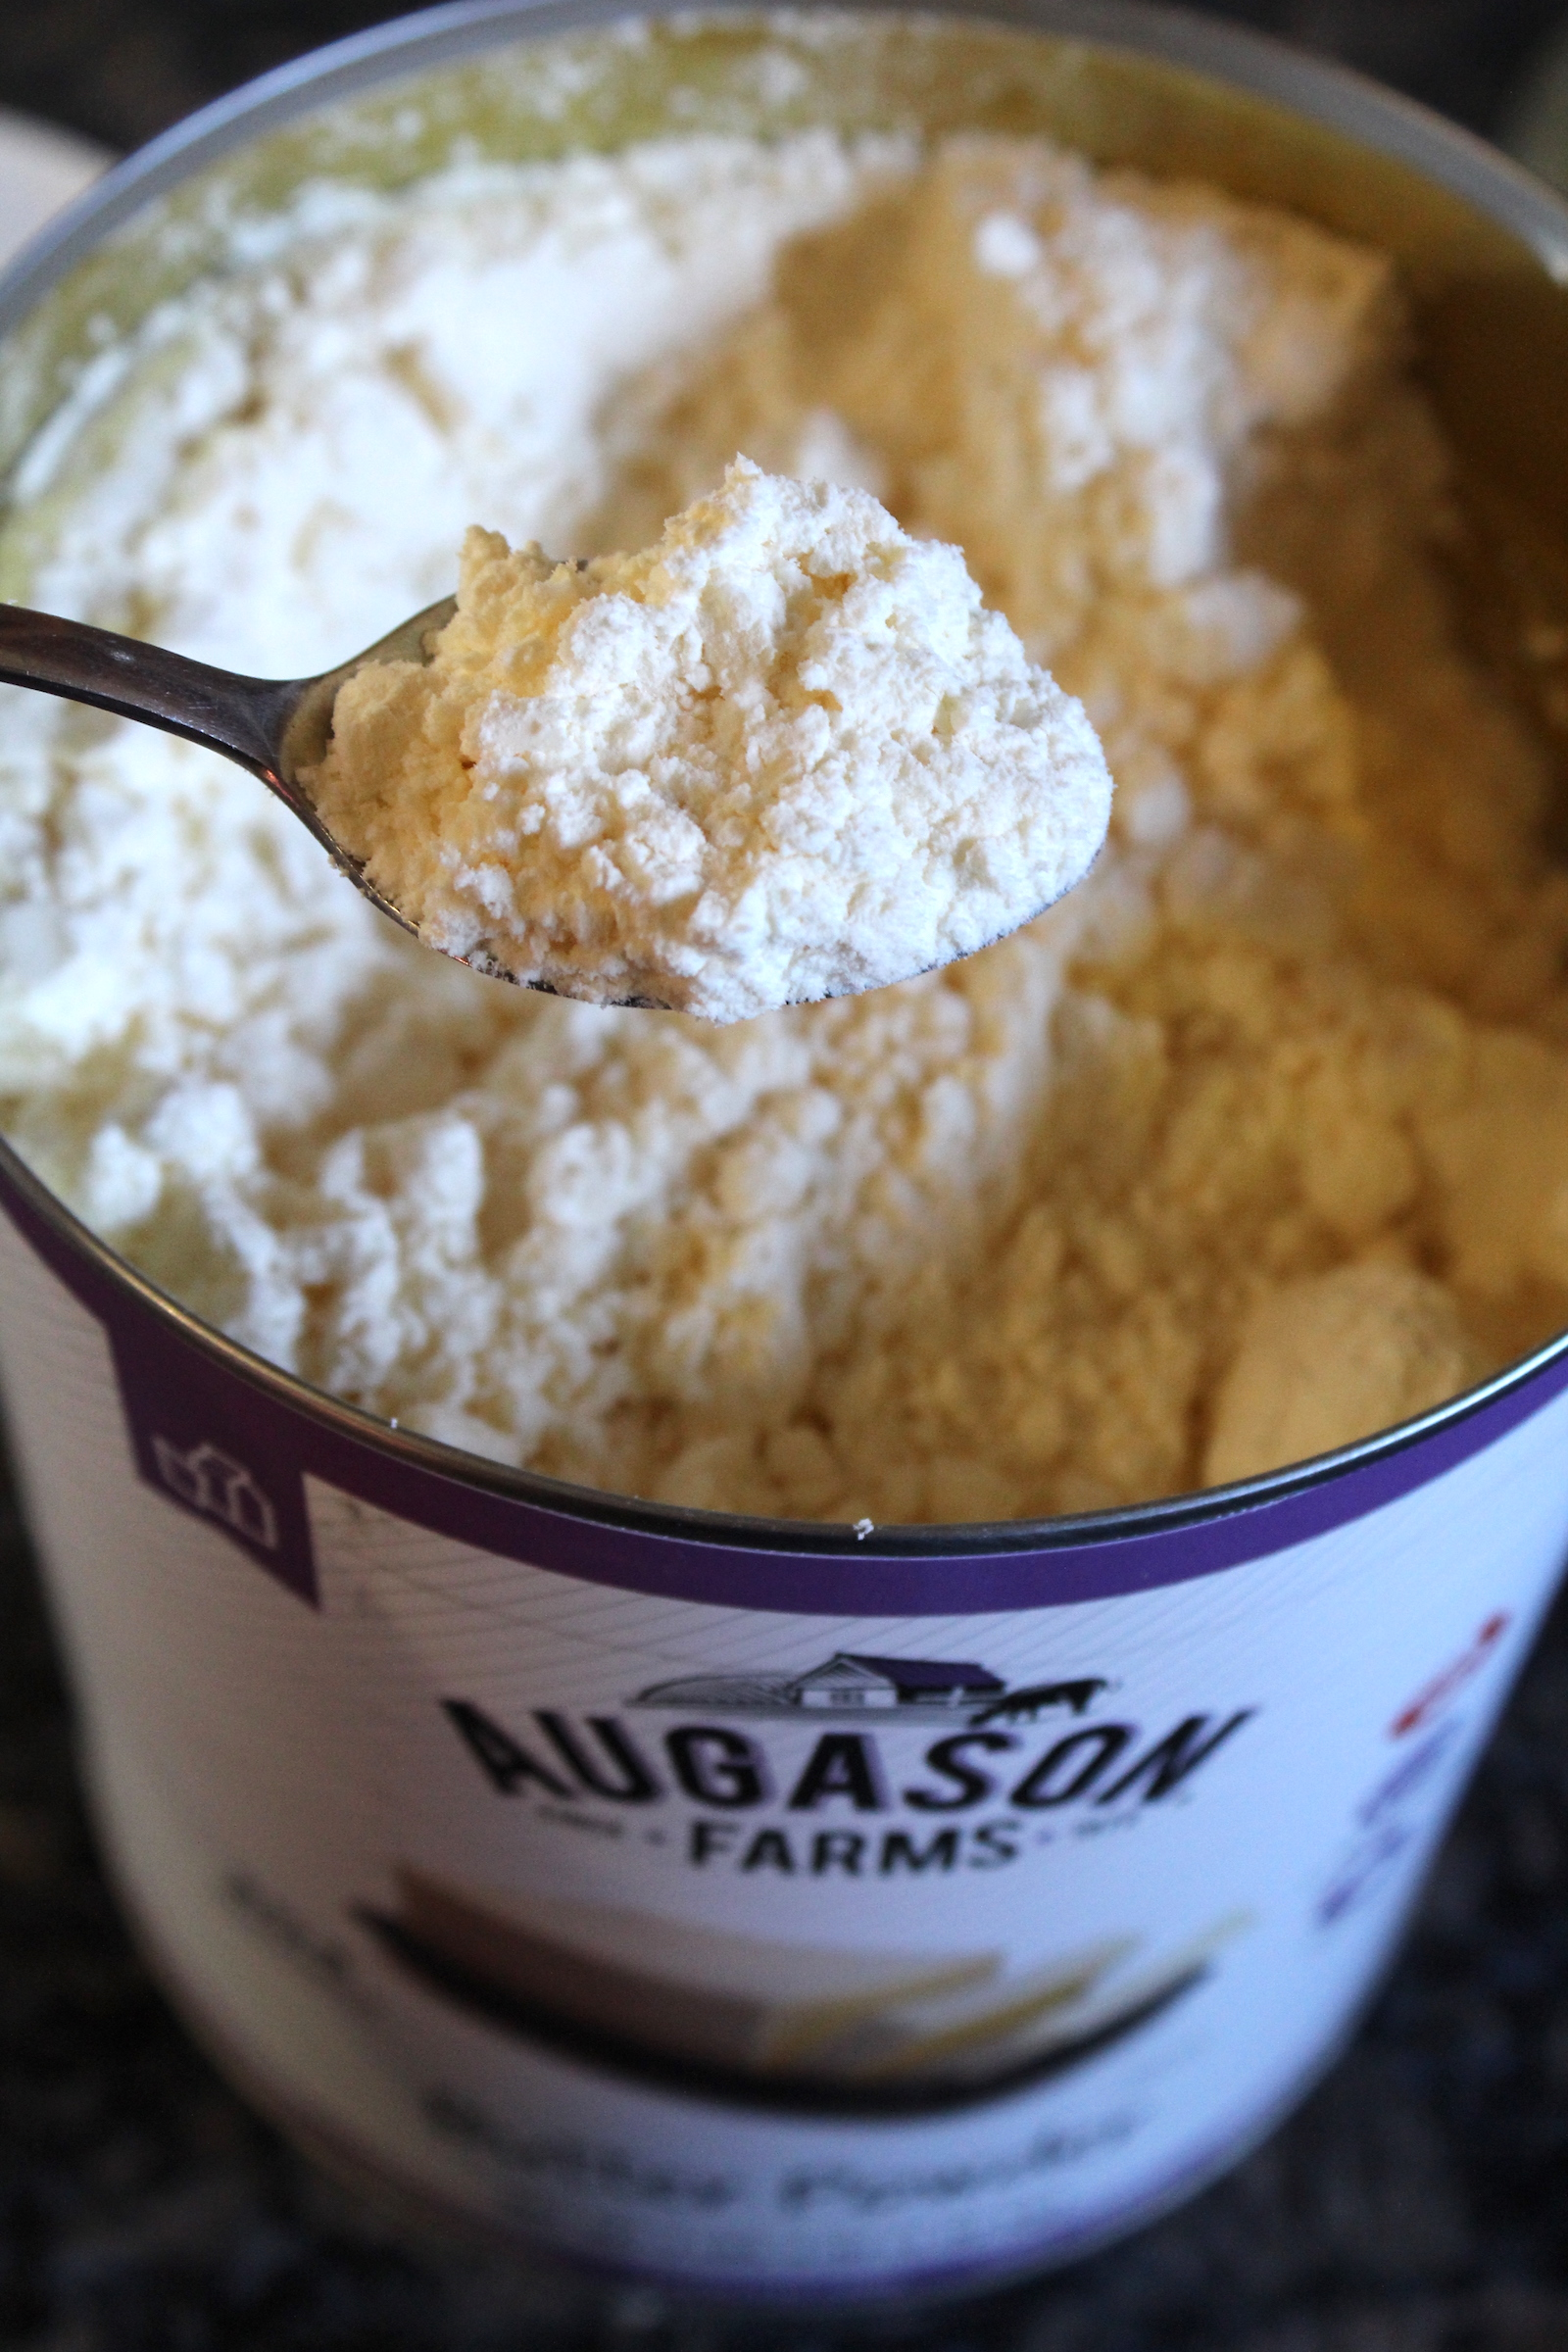 Augason Farms Butter Powder